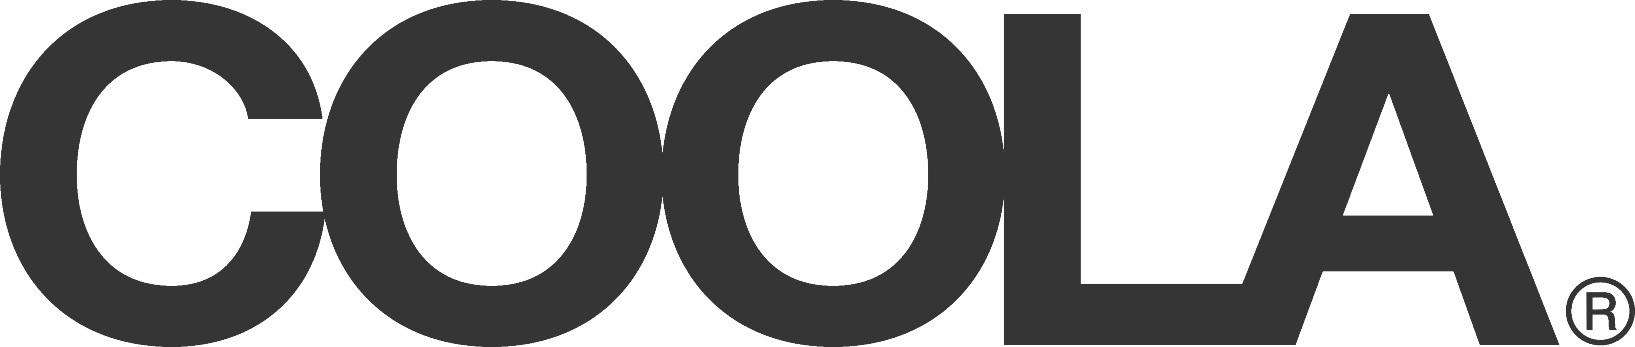 coola_horizontal_logo_rgb[1].jpg